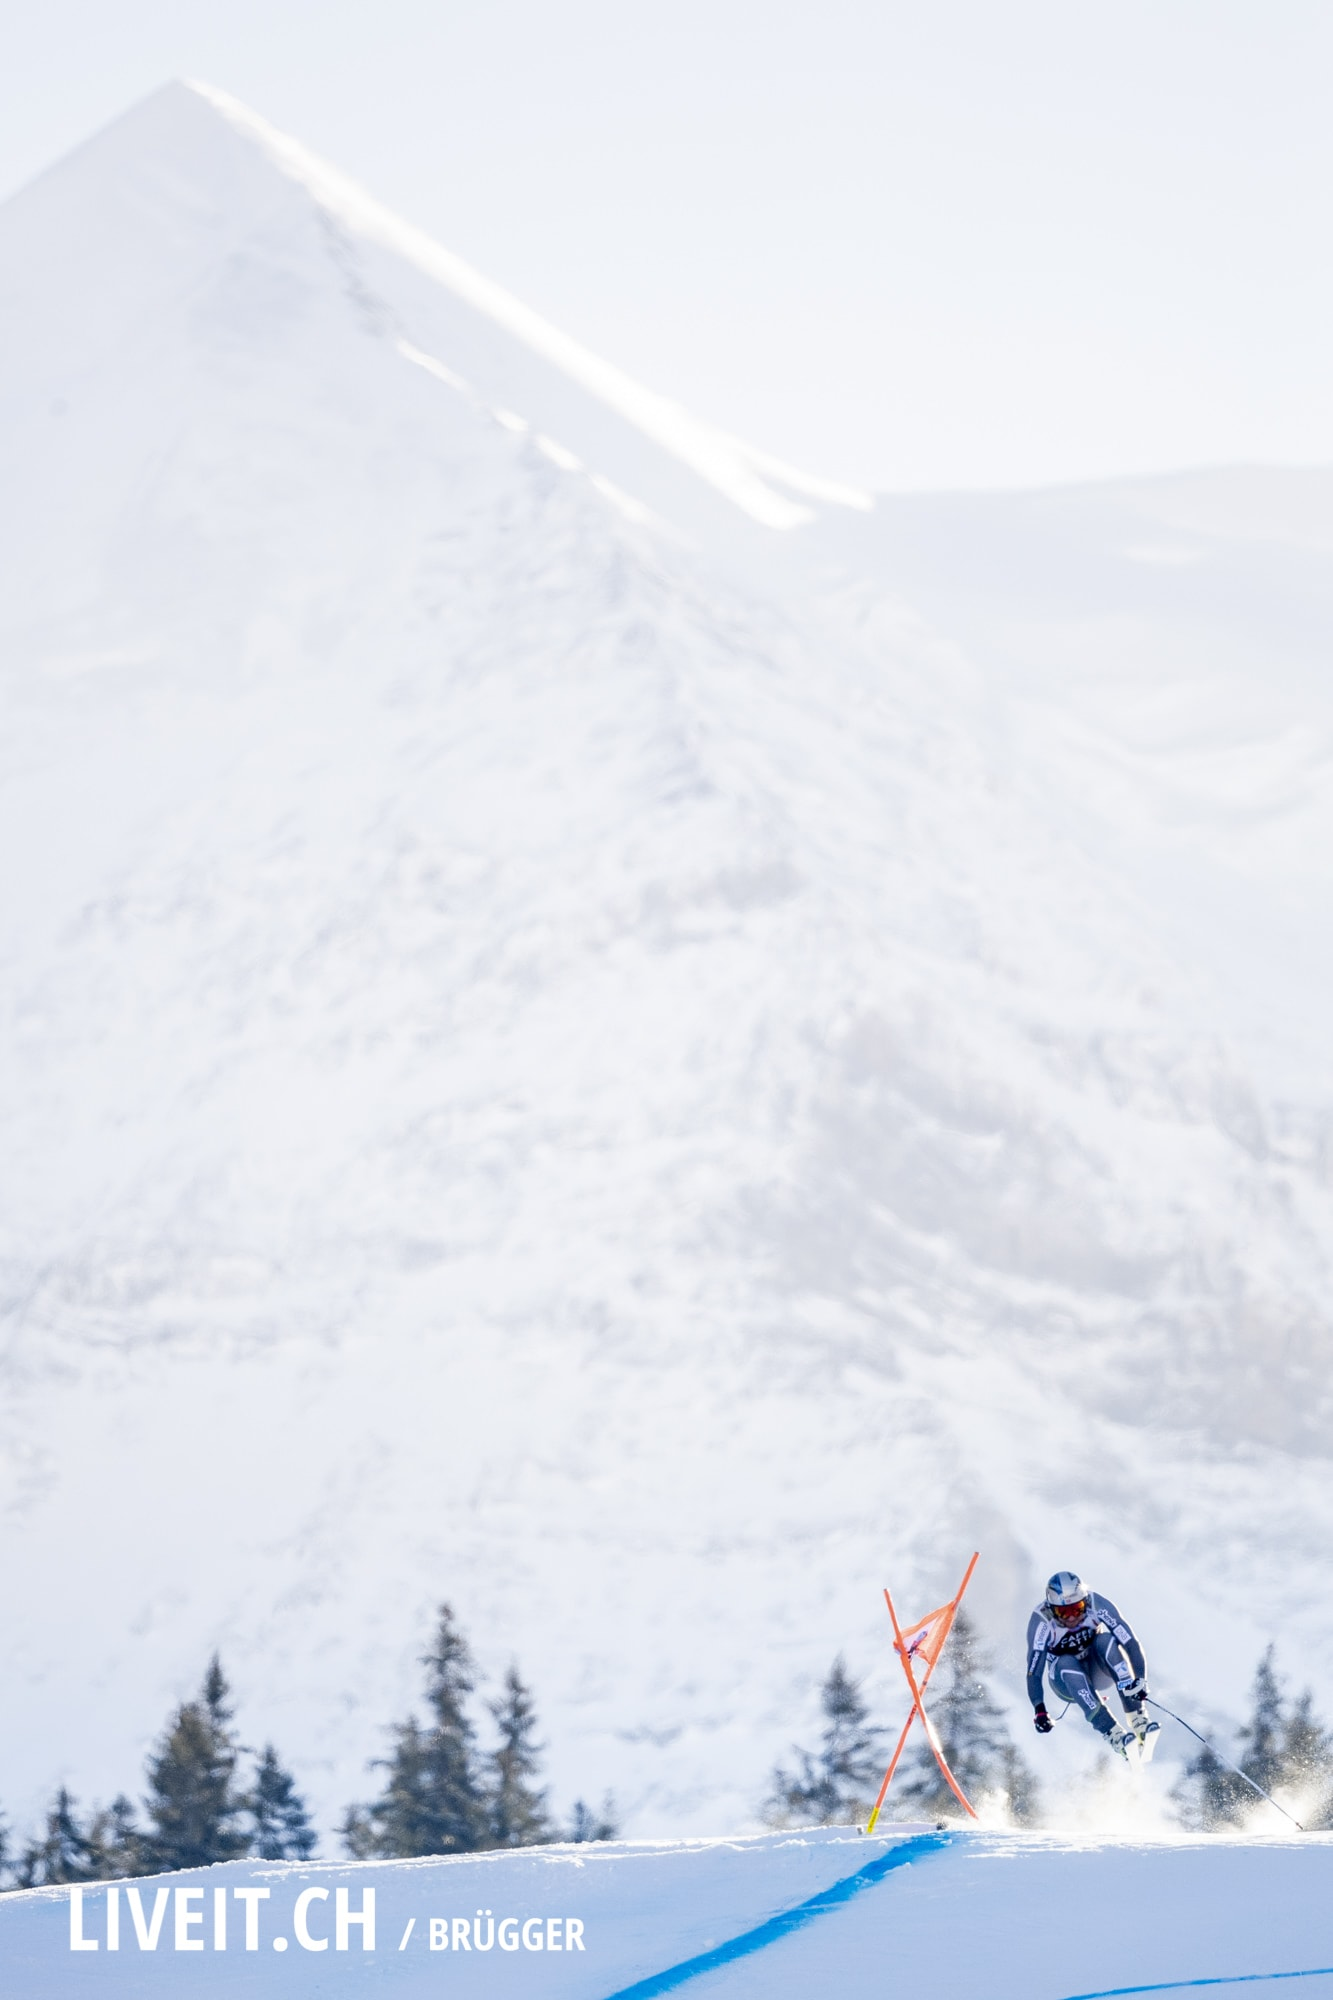 Aksel Lund Svindal (NOR) fotografiert am Samstag, 19. Januar 2019 am Lauberhornrennen in der Disziplin: Abfahrt. (Fotografiert von Dominic Bruegger liveit.ch)